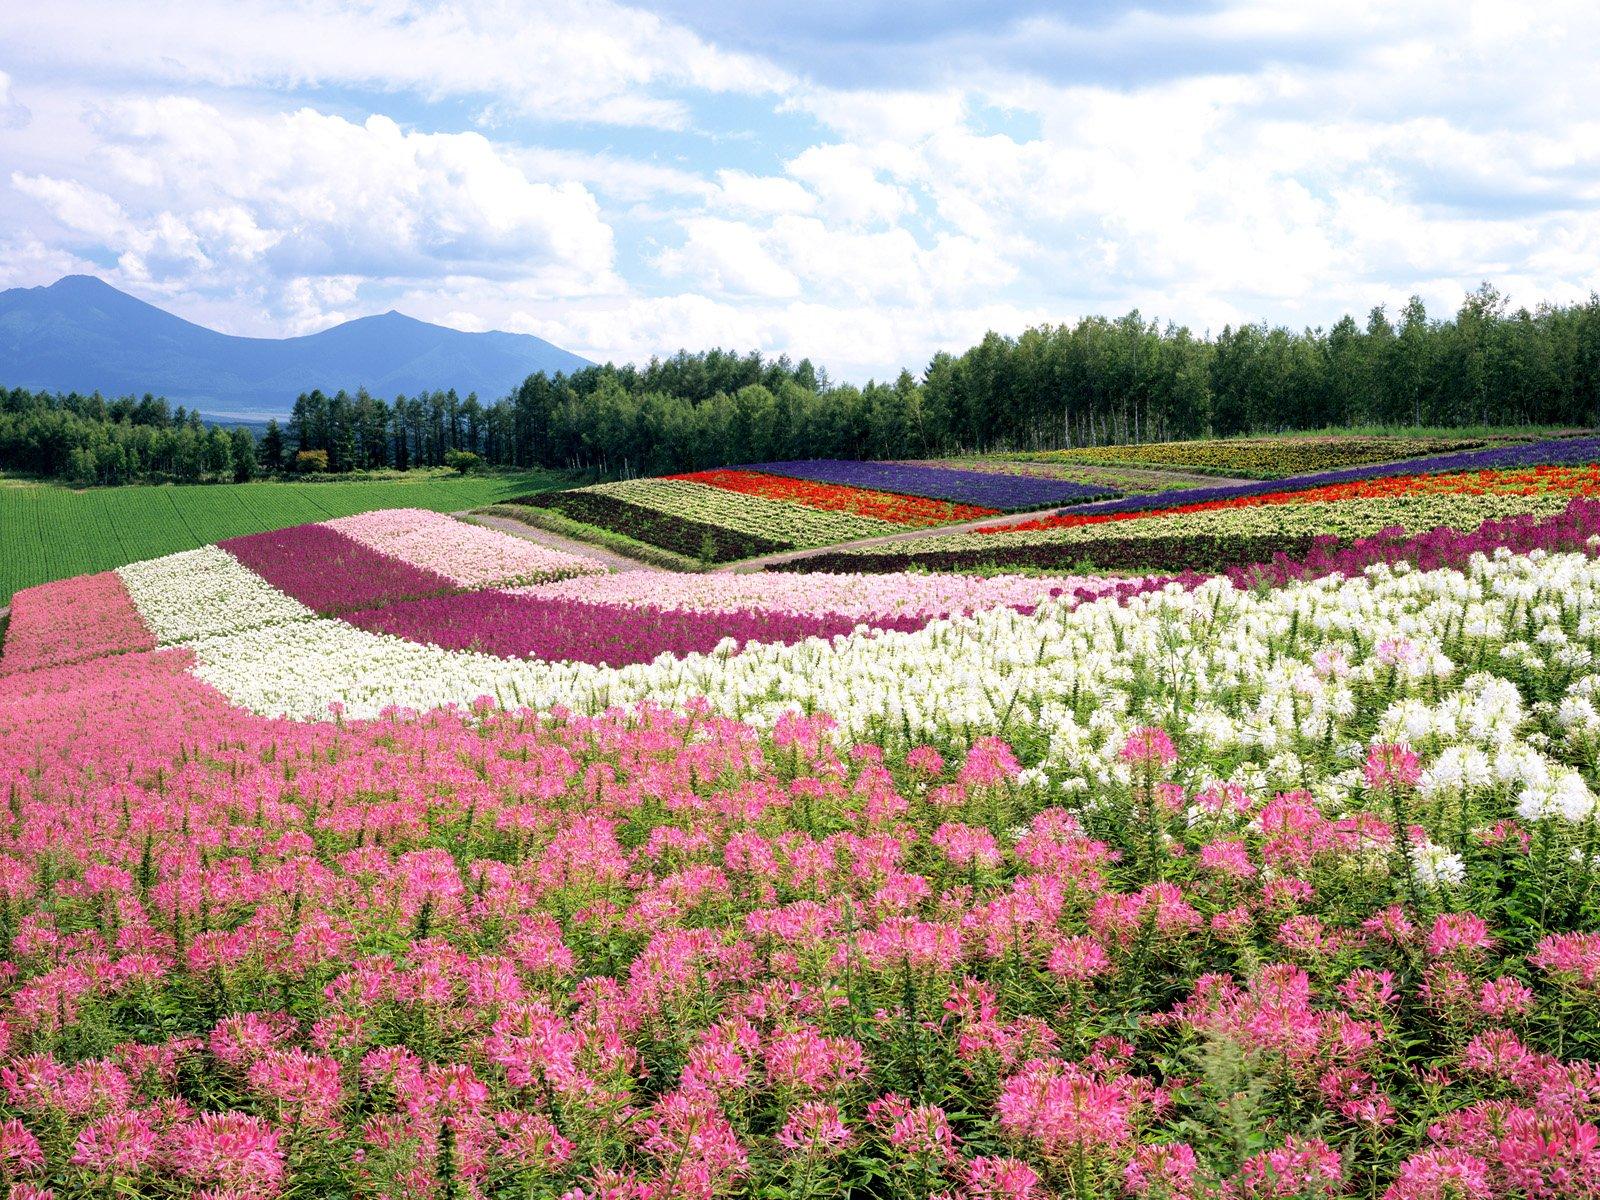 Deanne Morrison flower garden background 1600x1200